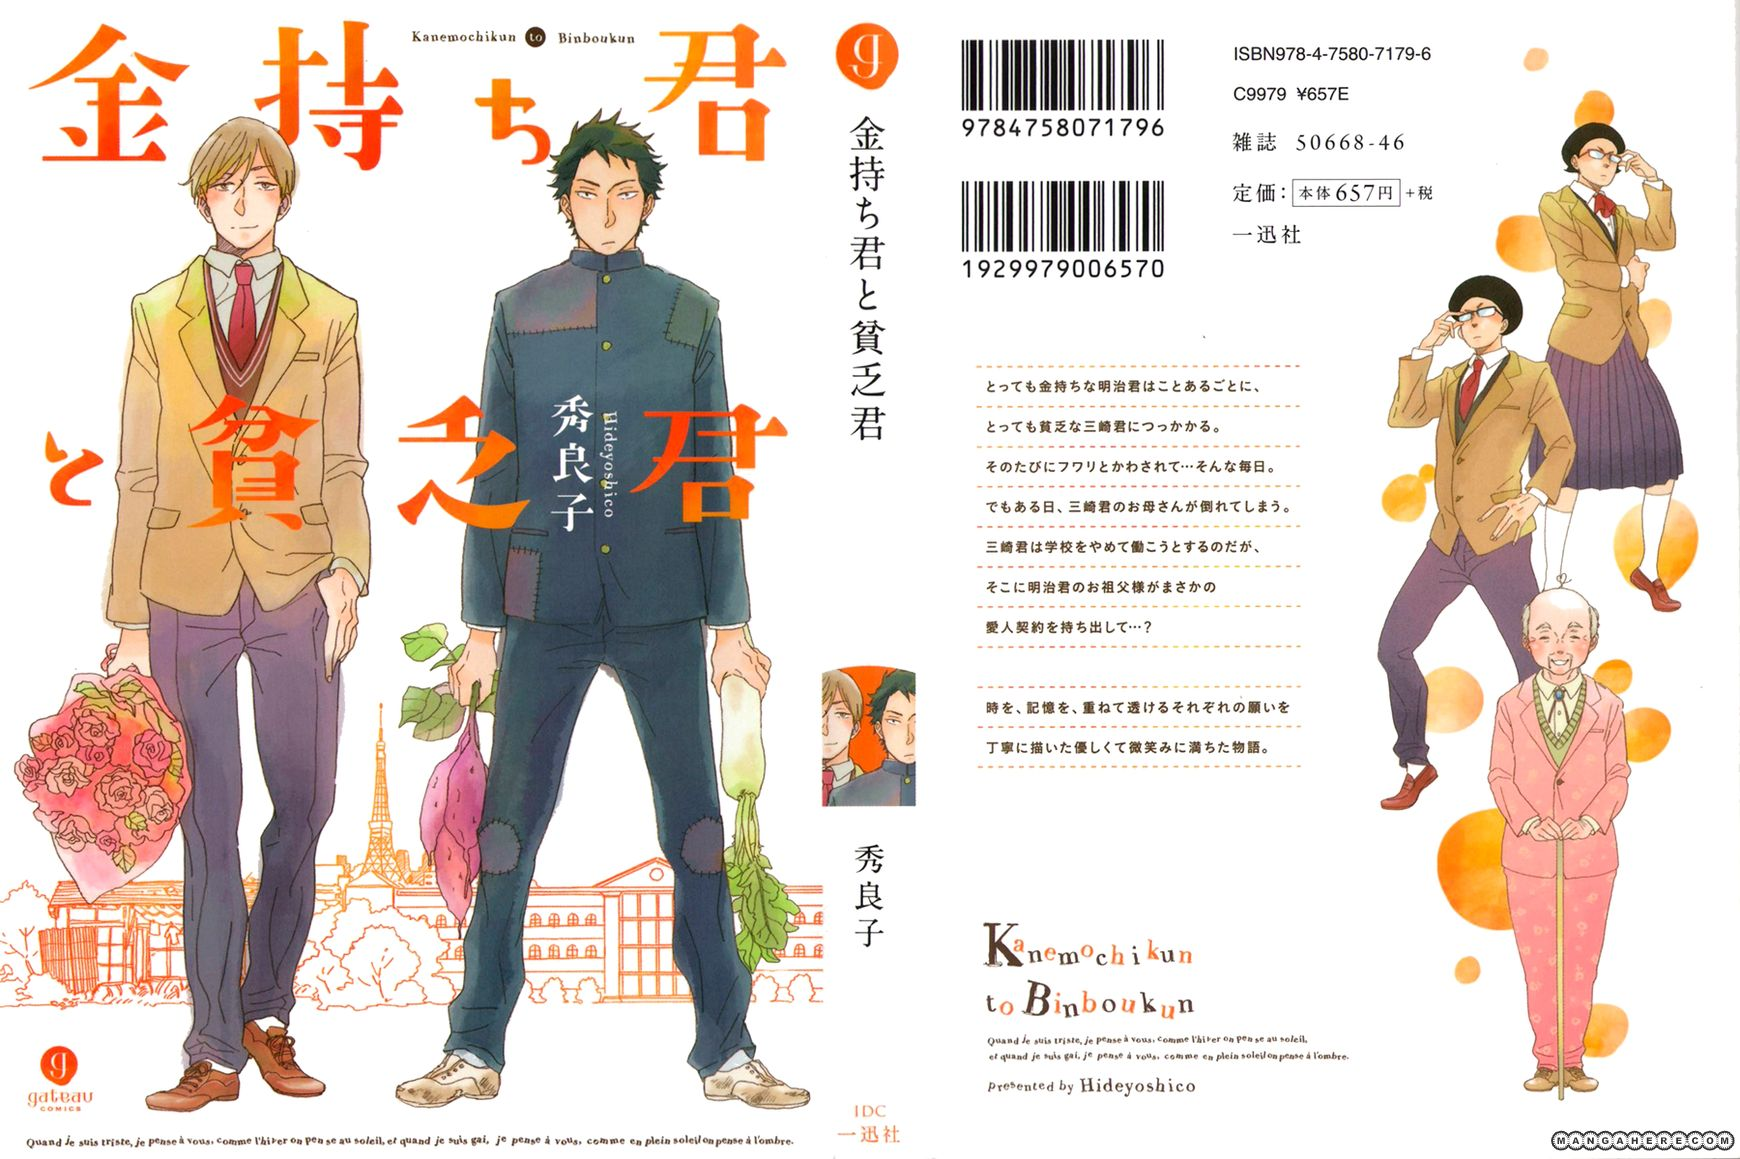 Kanemochi-kun to Binbou-kun 1 Page 2